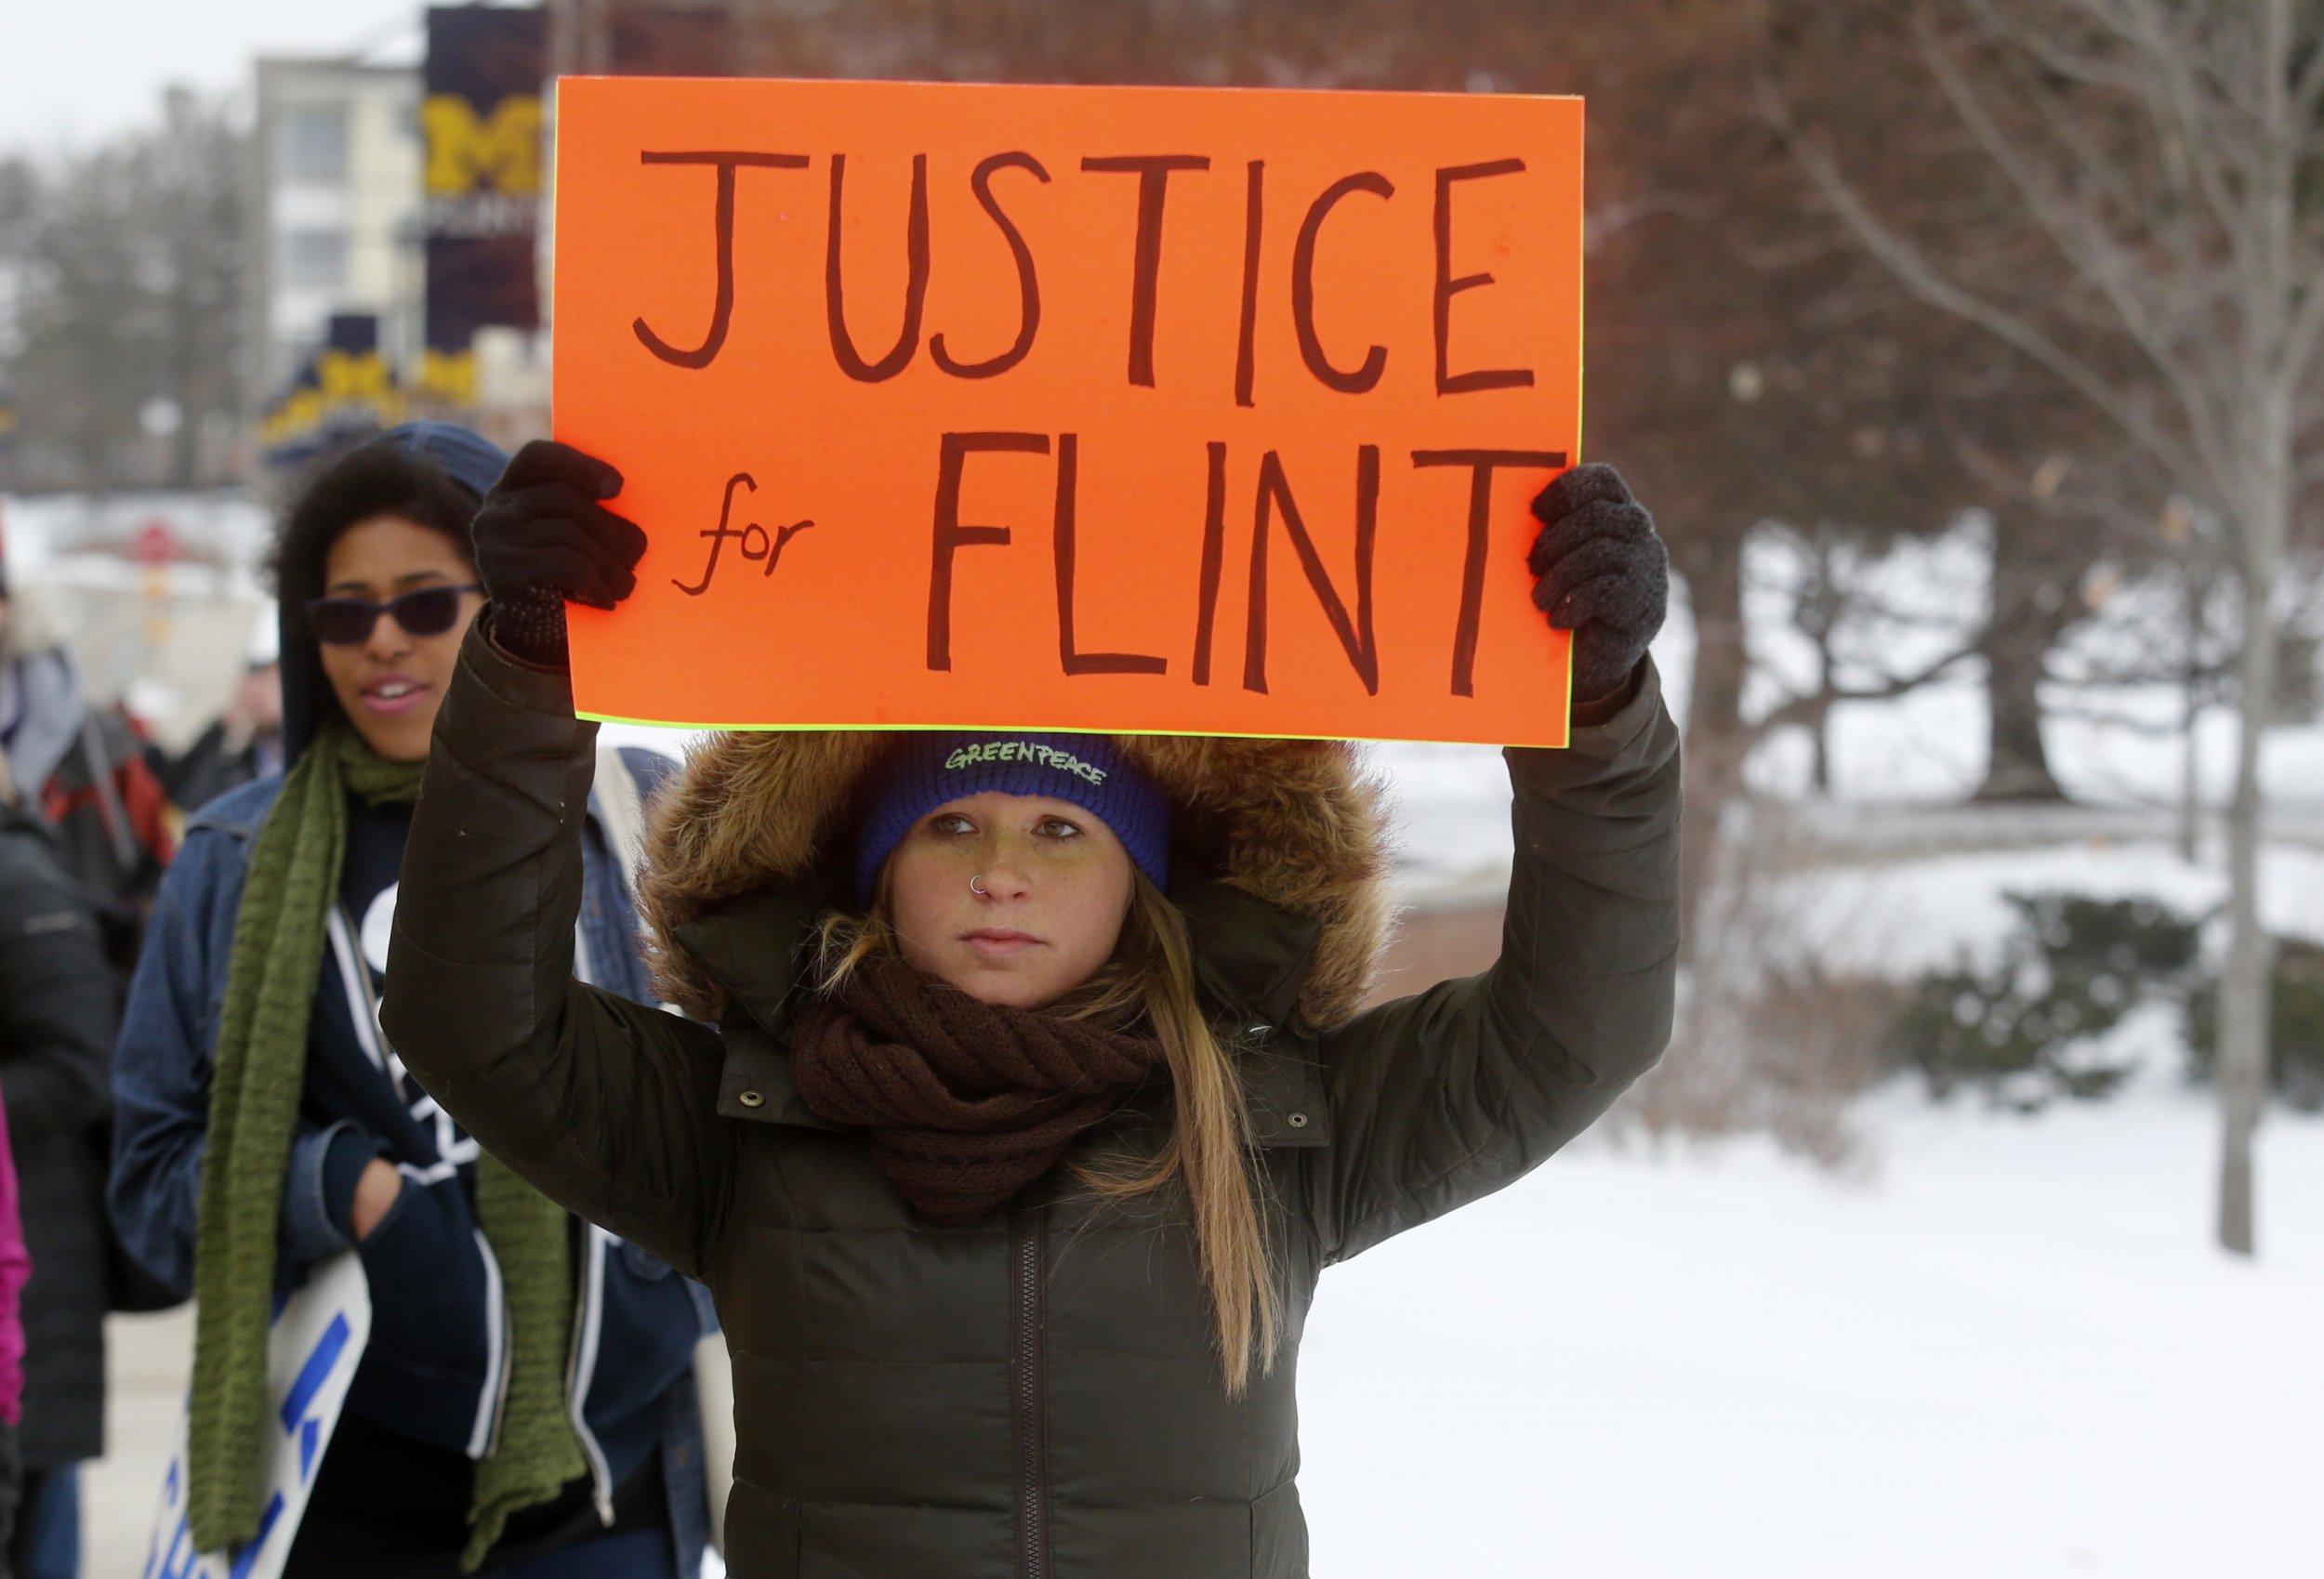 03_11_Flint_Lawsuits_01